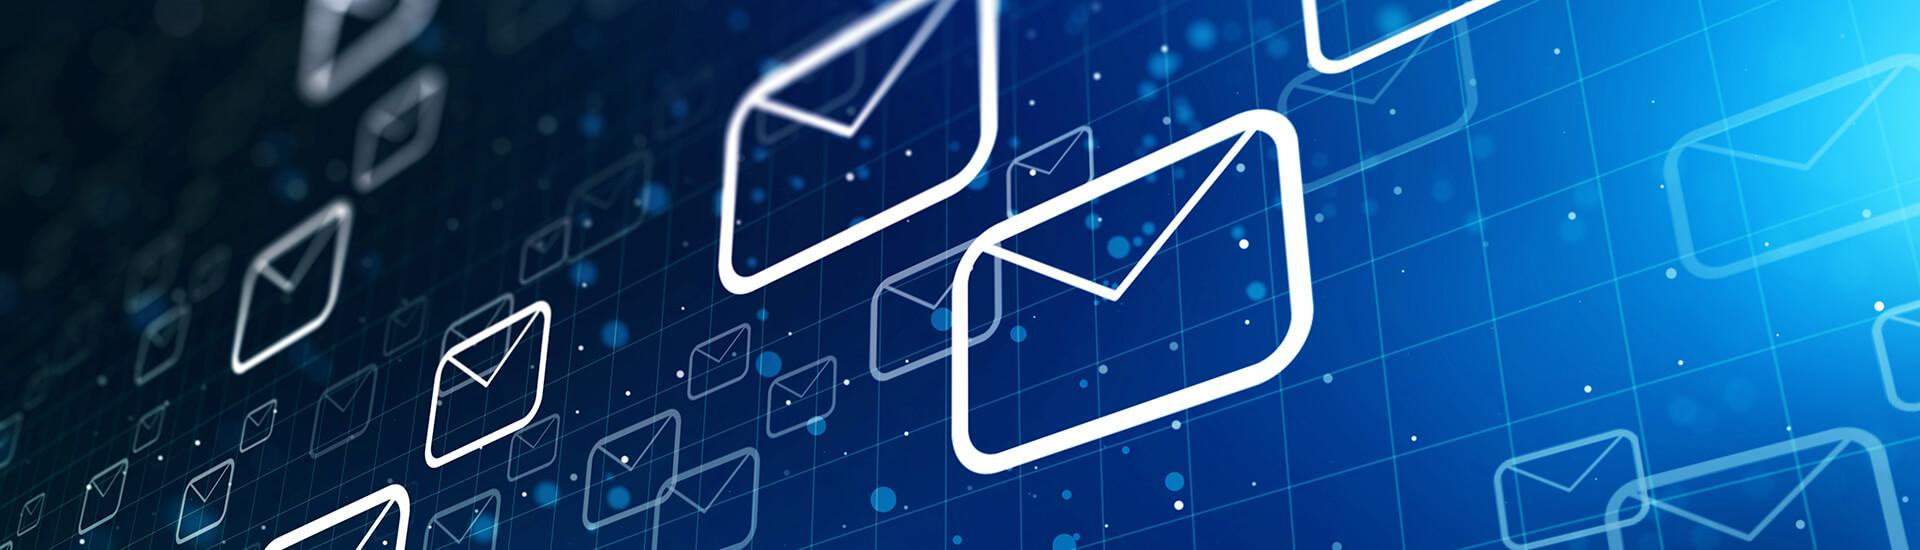 Web Service - Email Marketing - 1